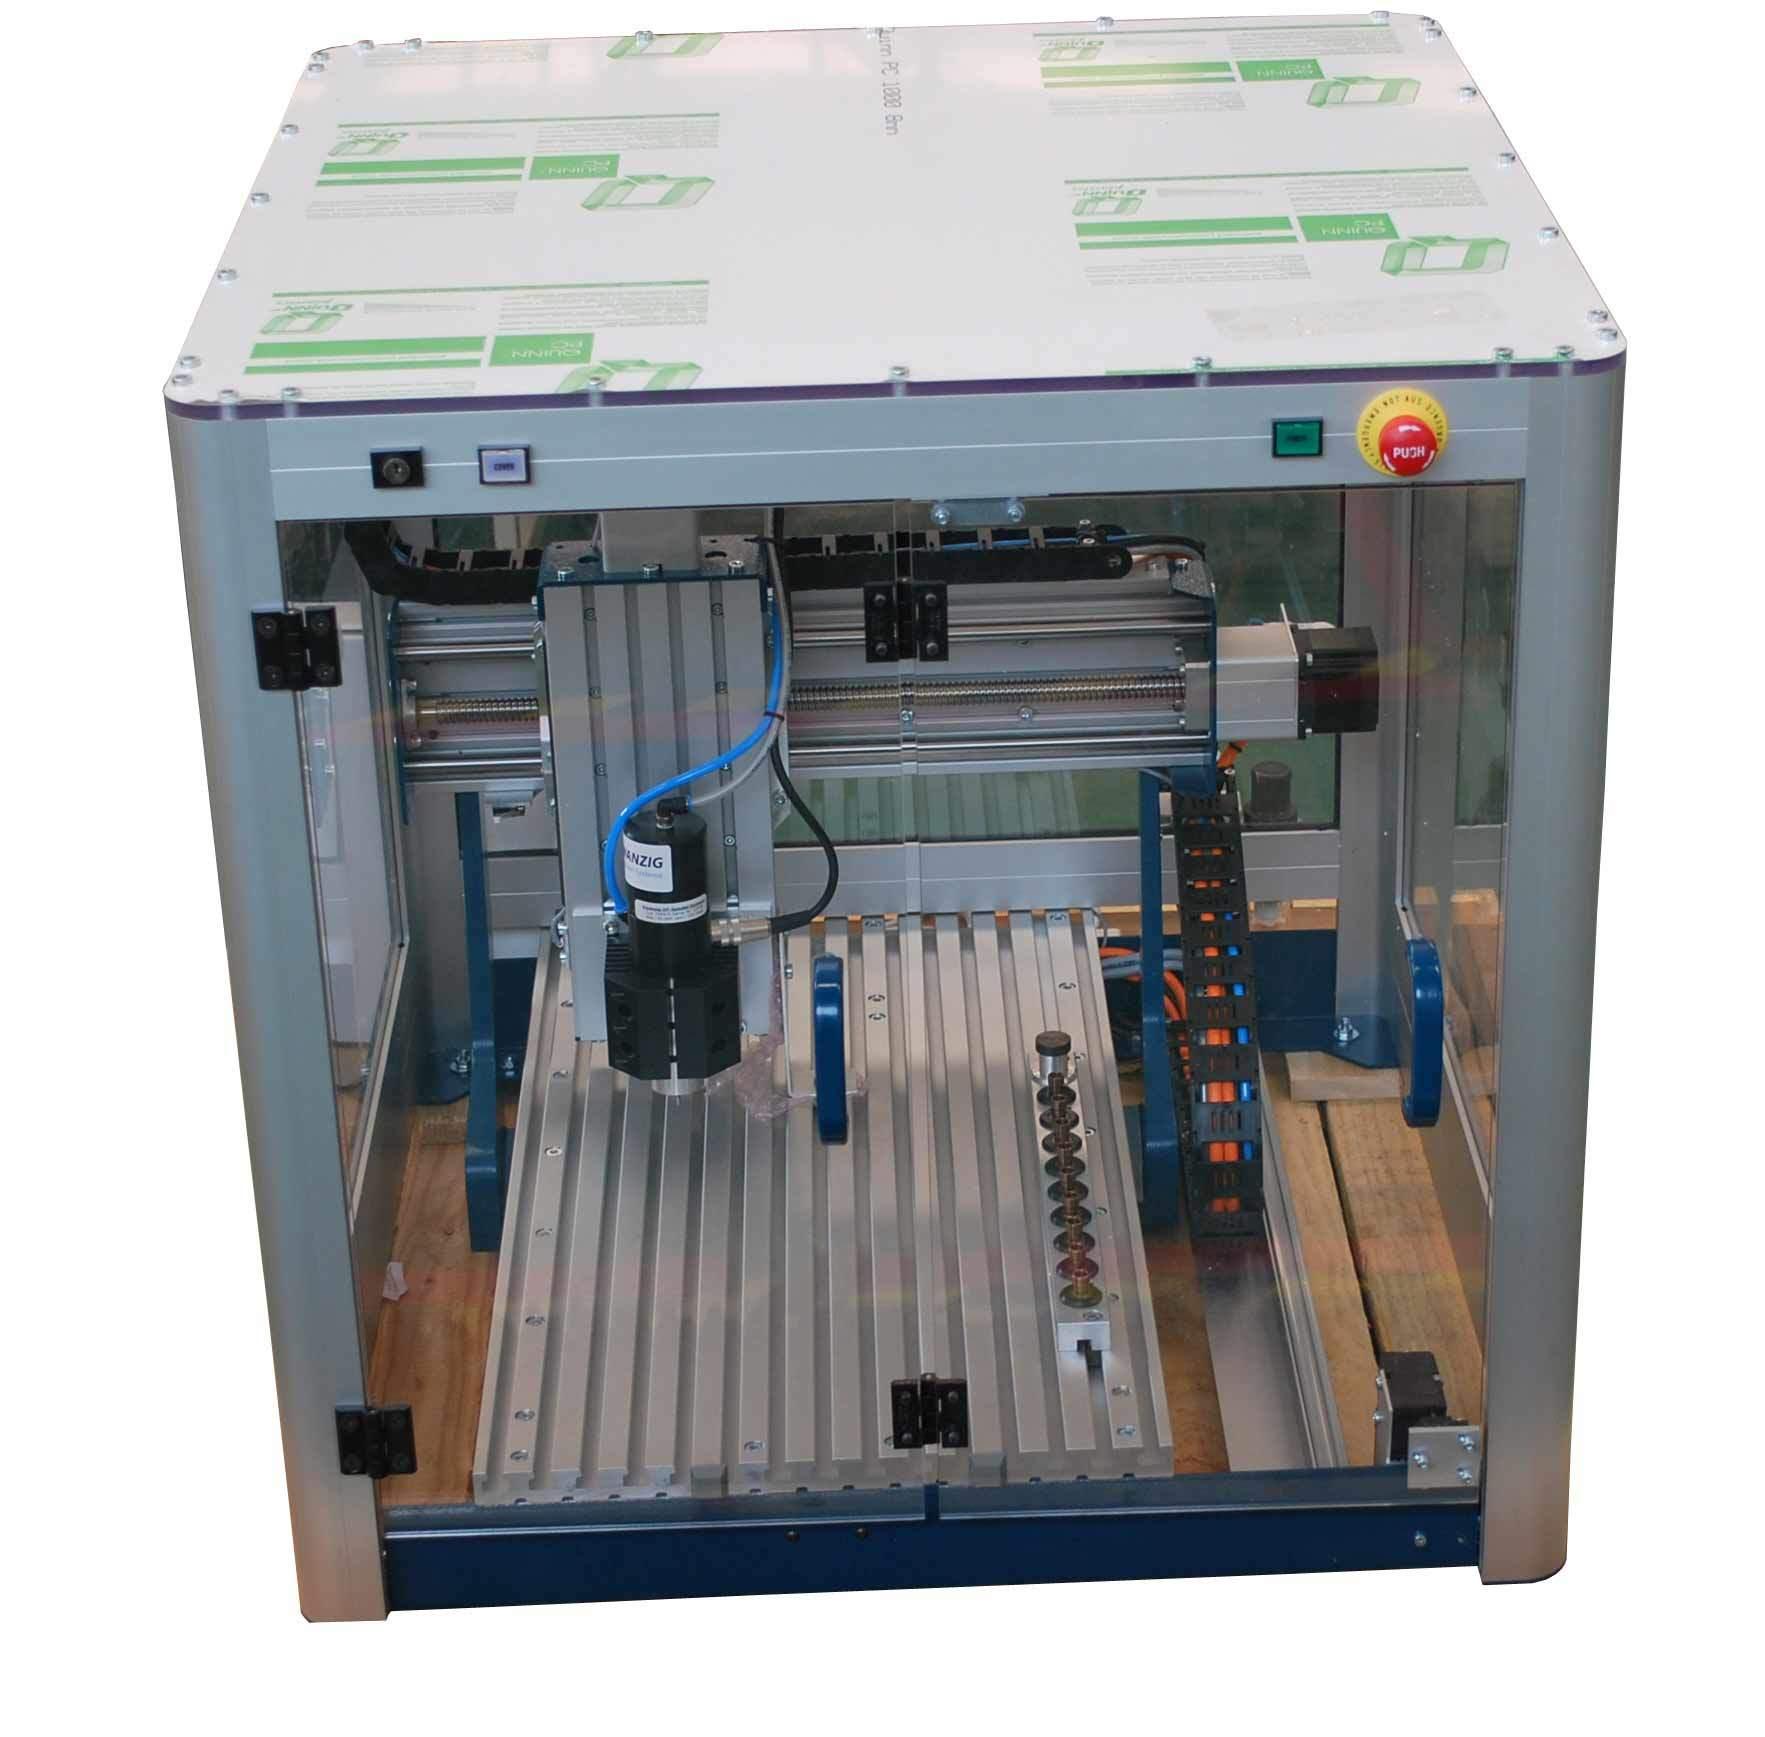 China Cnc High Precision Pcb Making Machine 3200a Drill Speed Controller